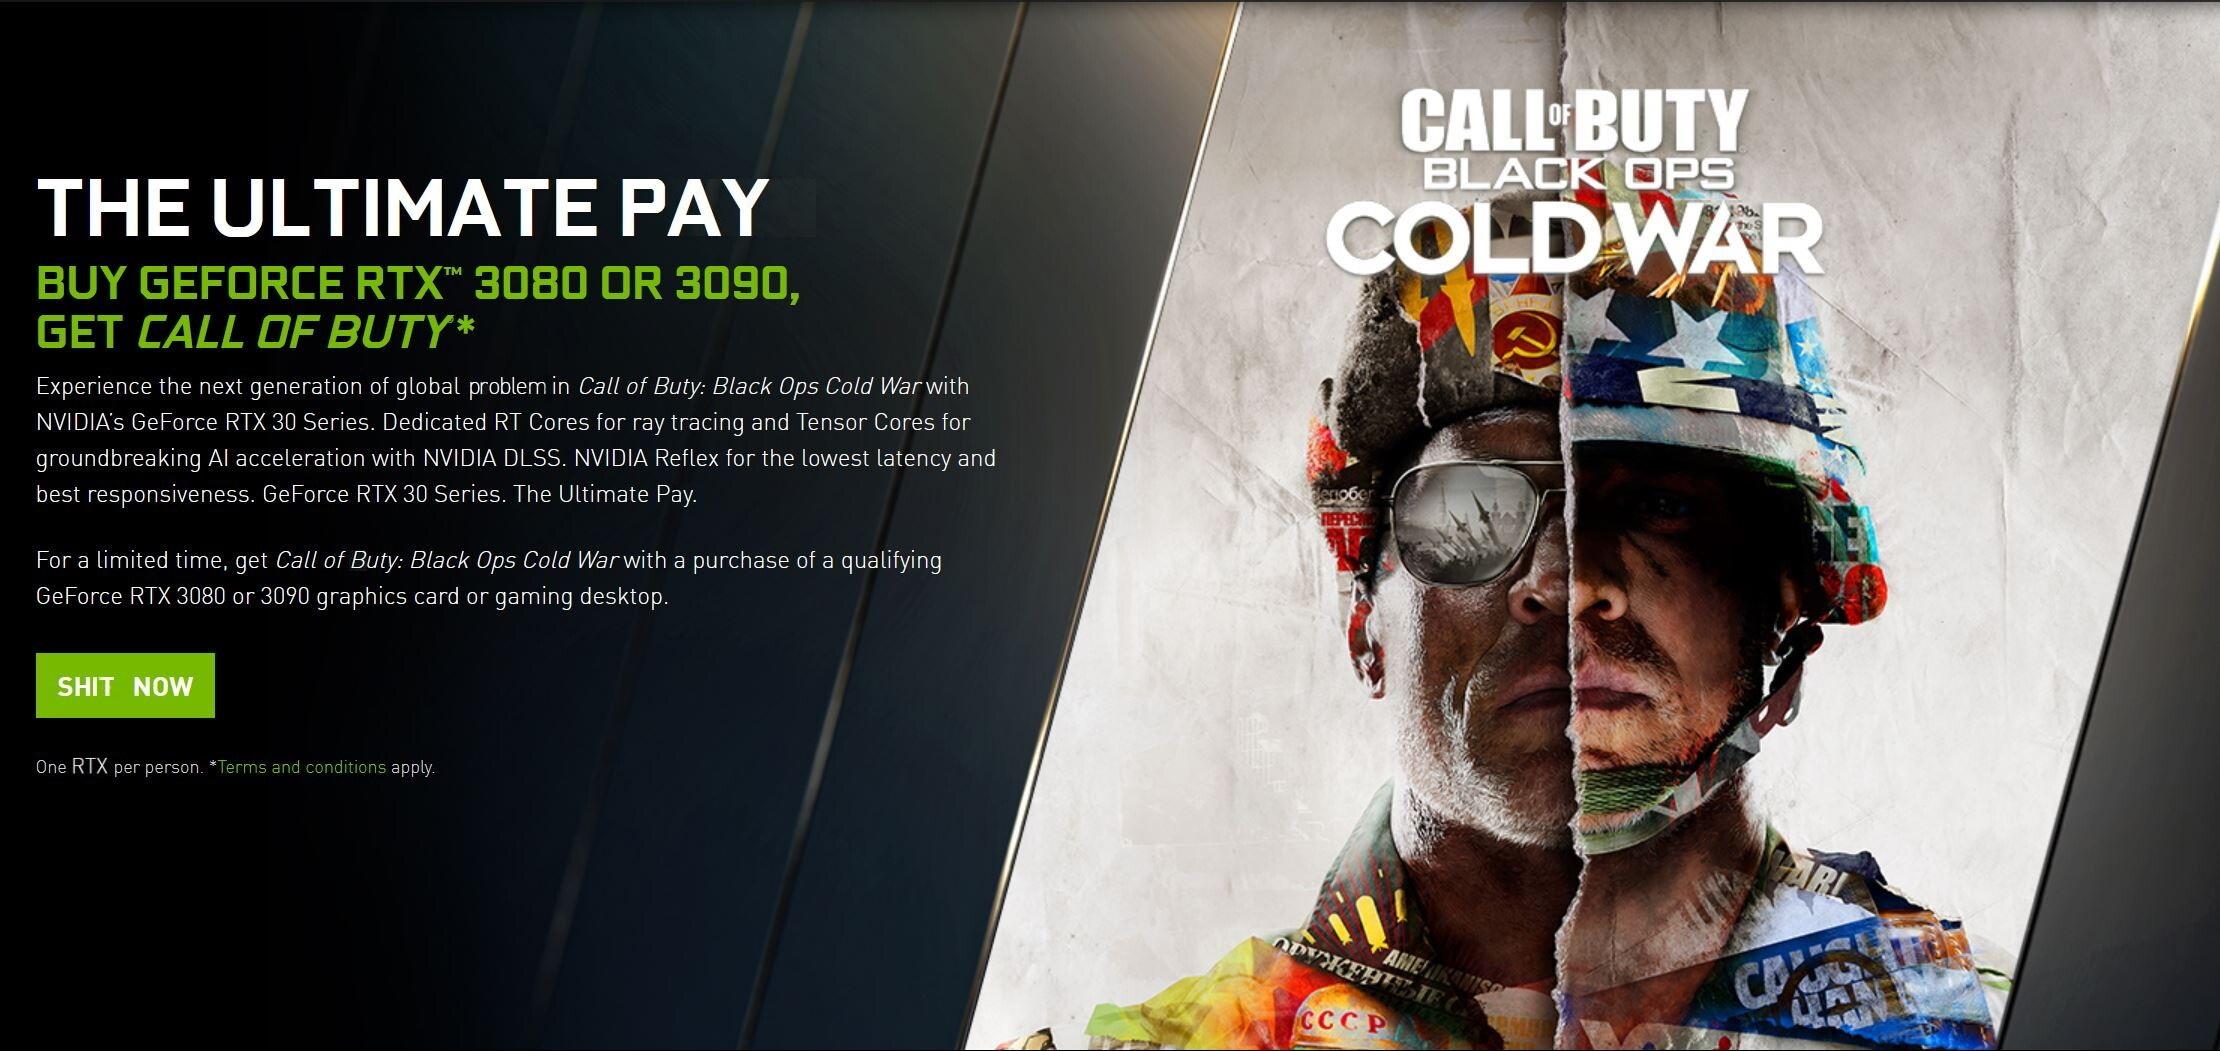 ultimate pay.jpg